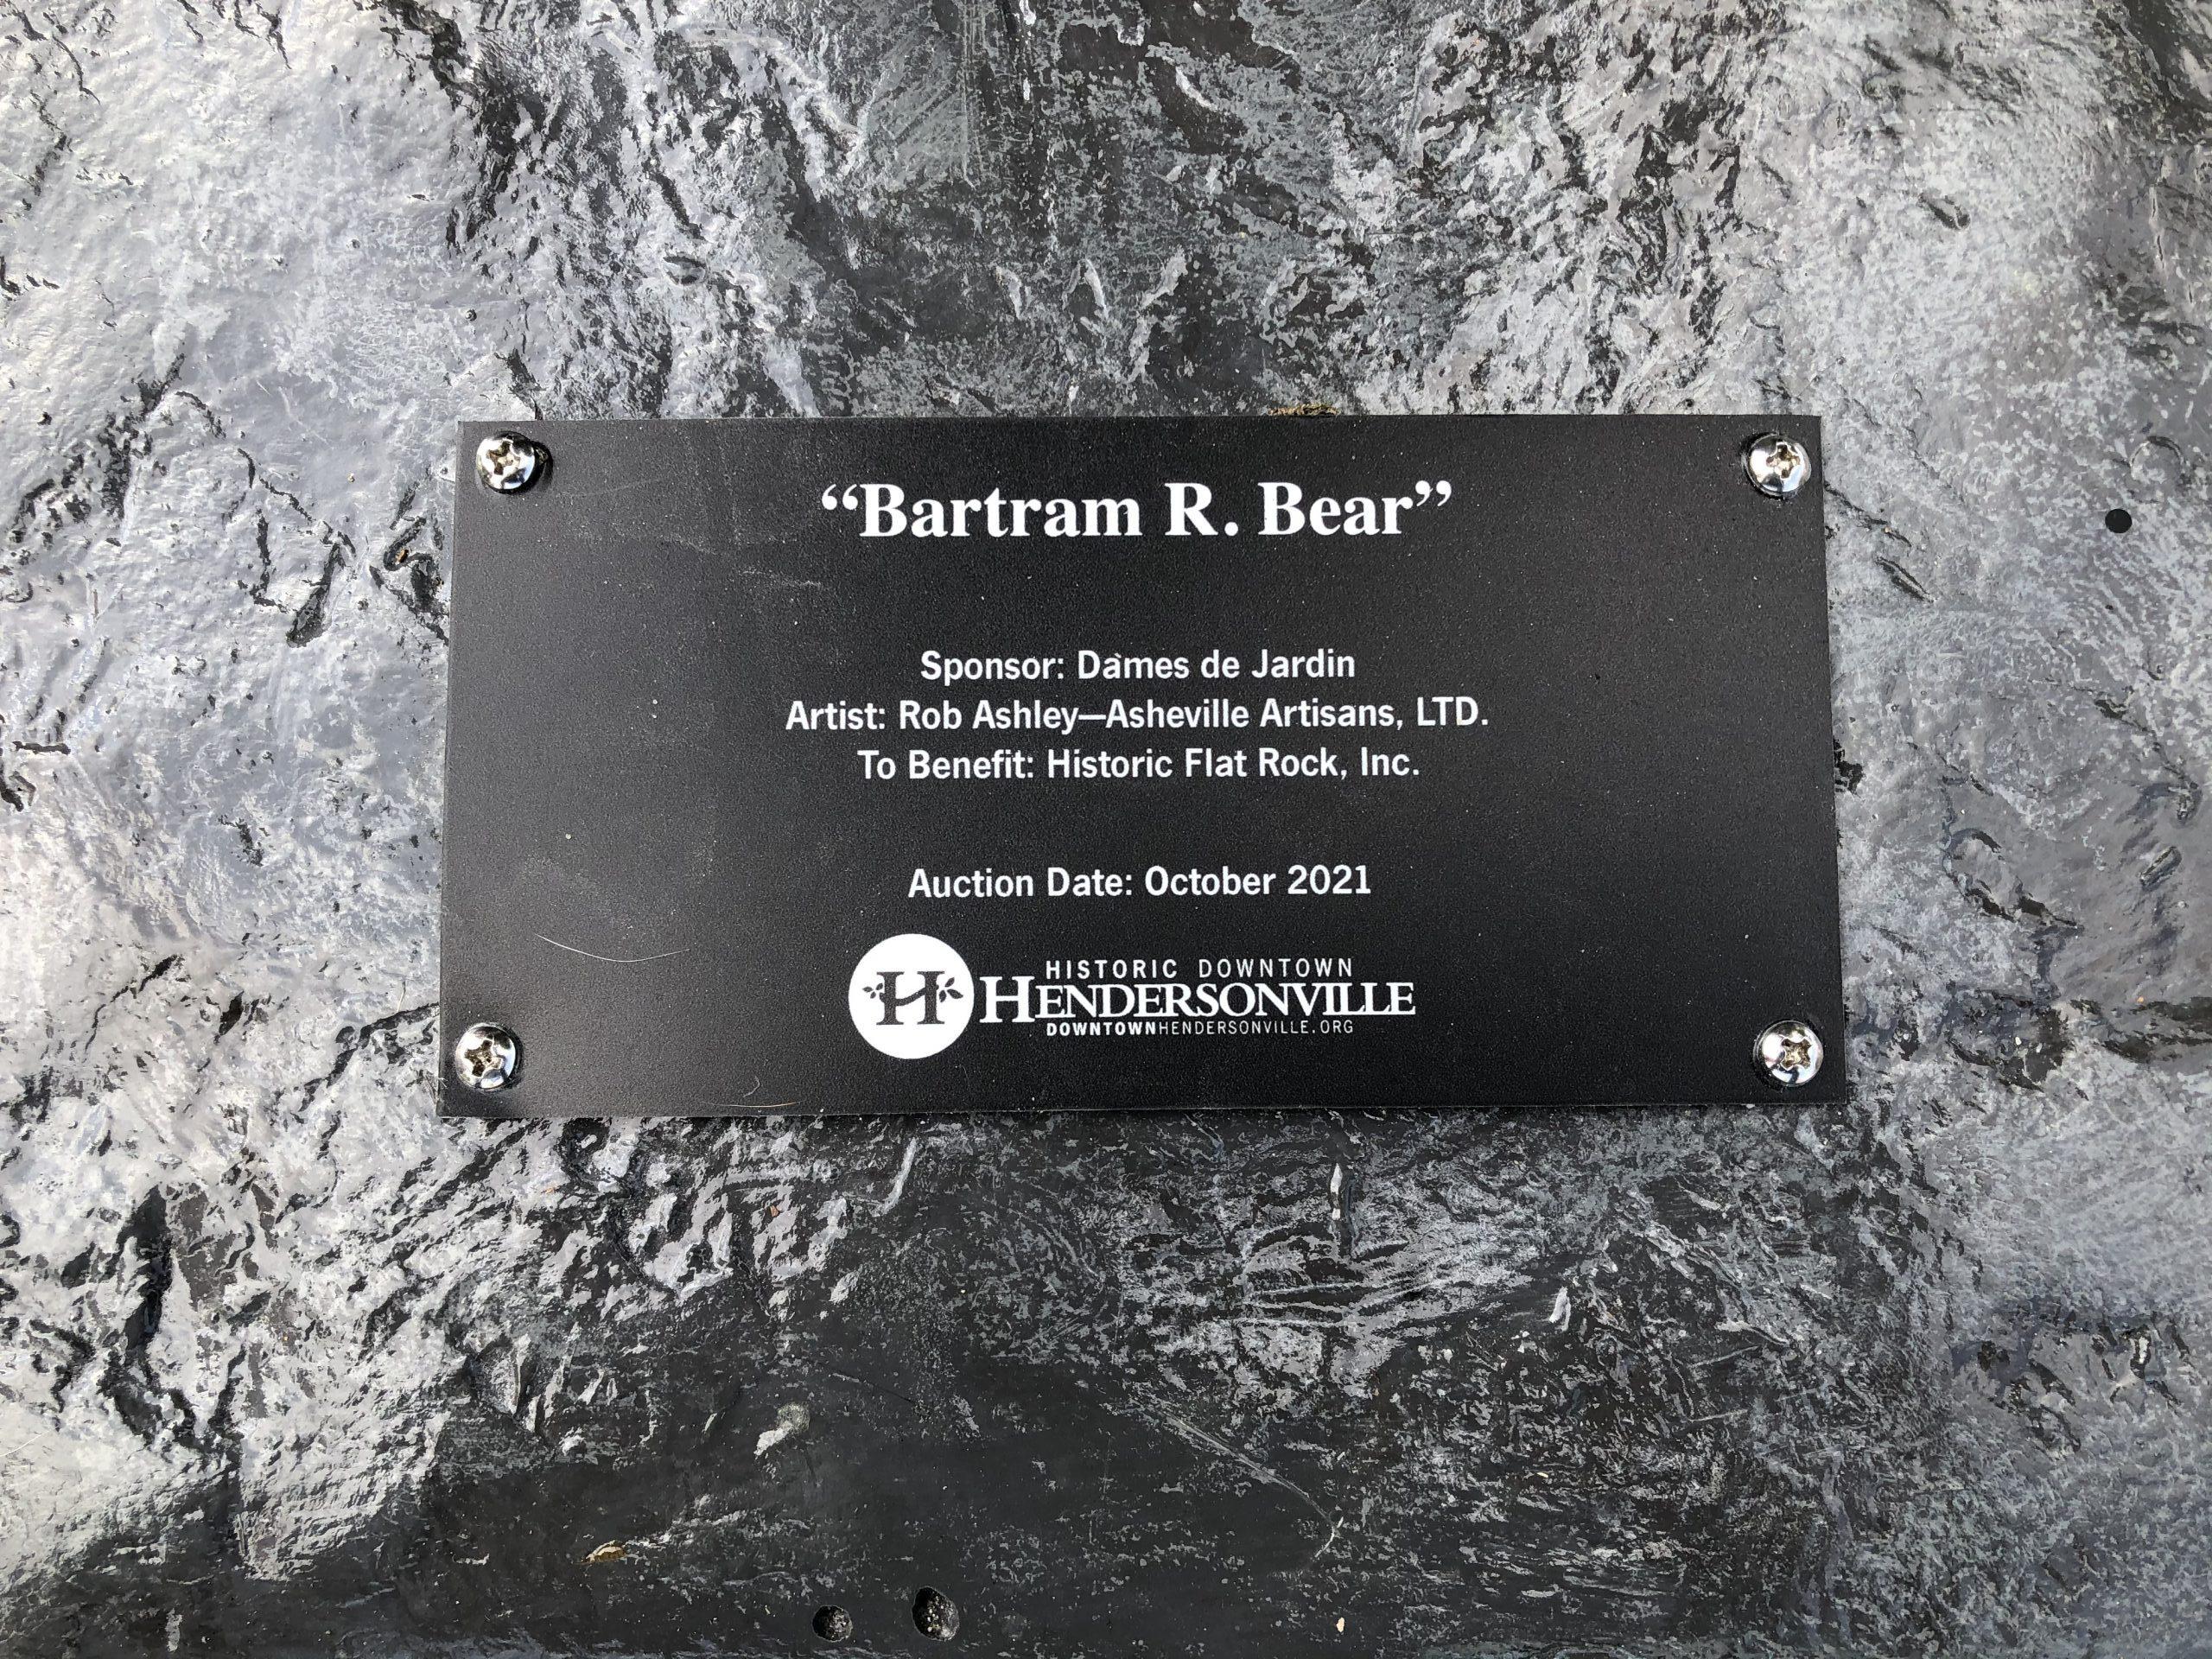 Bartram R. Bear Historic Flat Rock